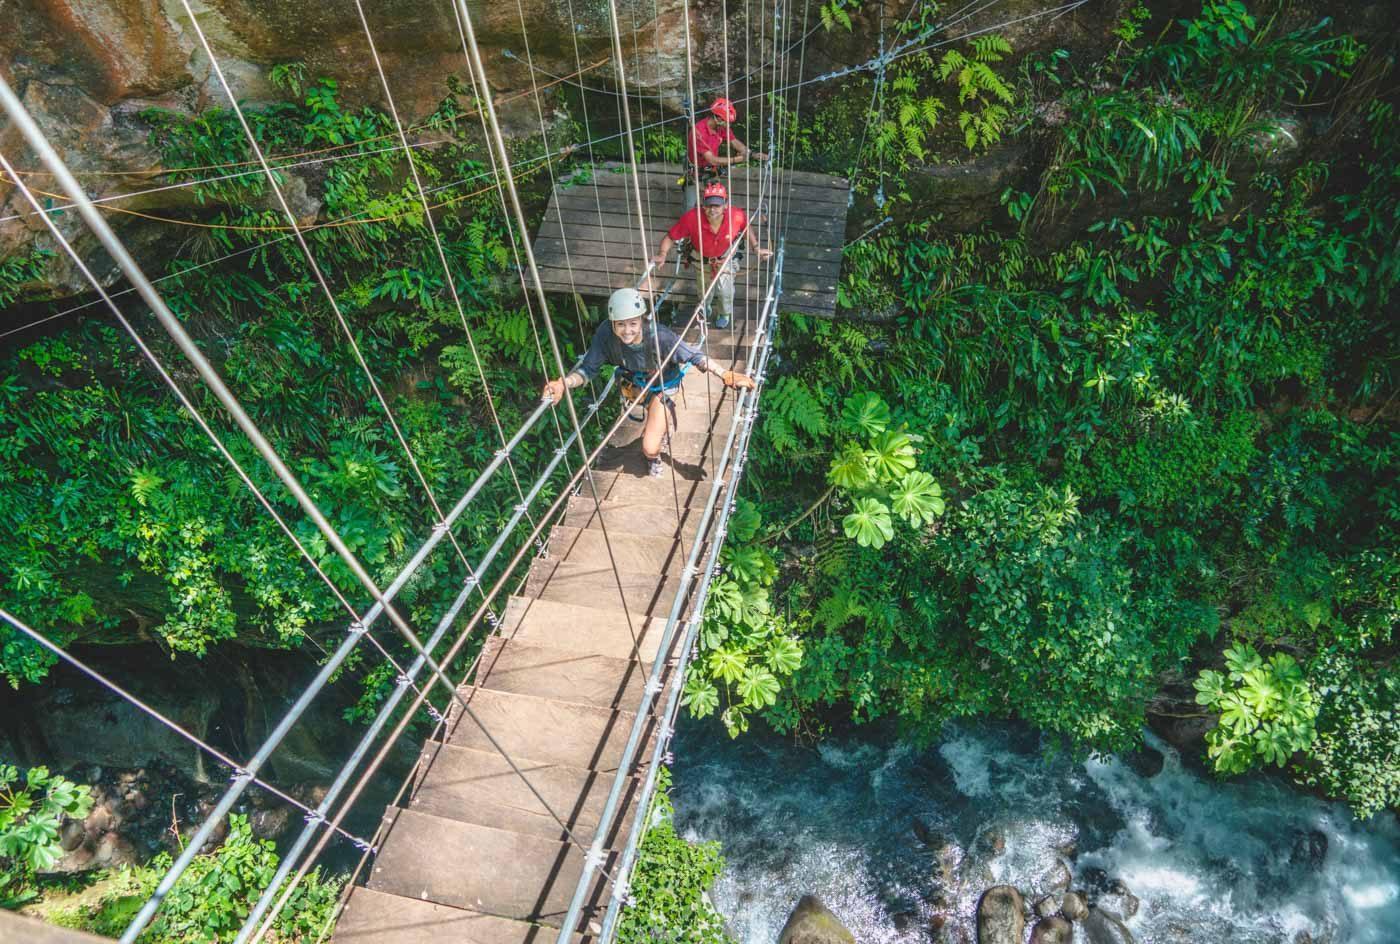 Costa Rica Guachipelin ziplining Oksana-3228